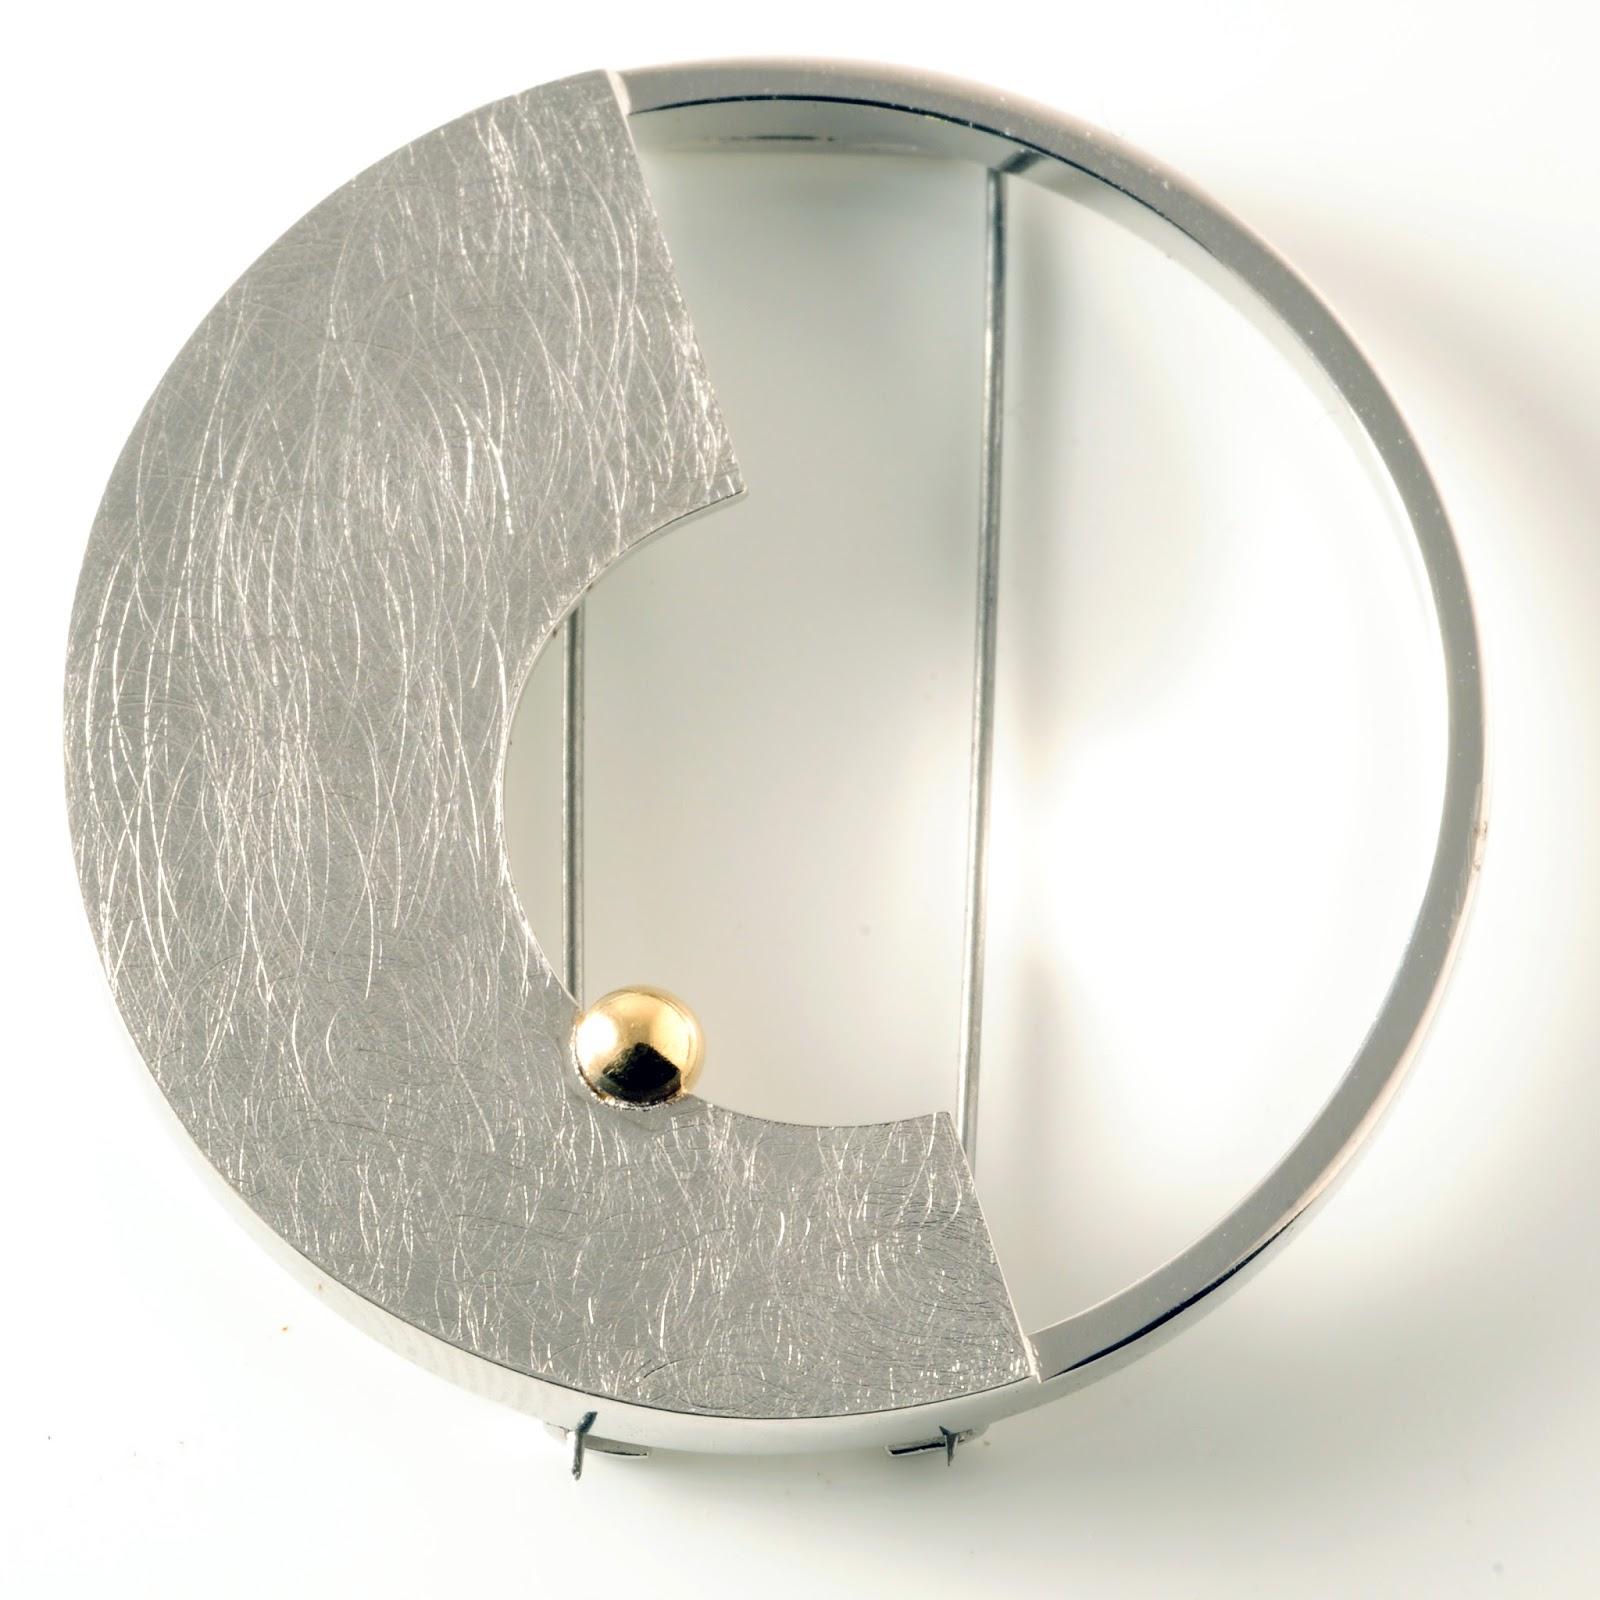 http://www.machidewaard.co.uk/index.html?folder=item&name=goldballhalfflatcirclebrooch